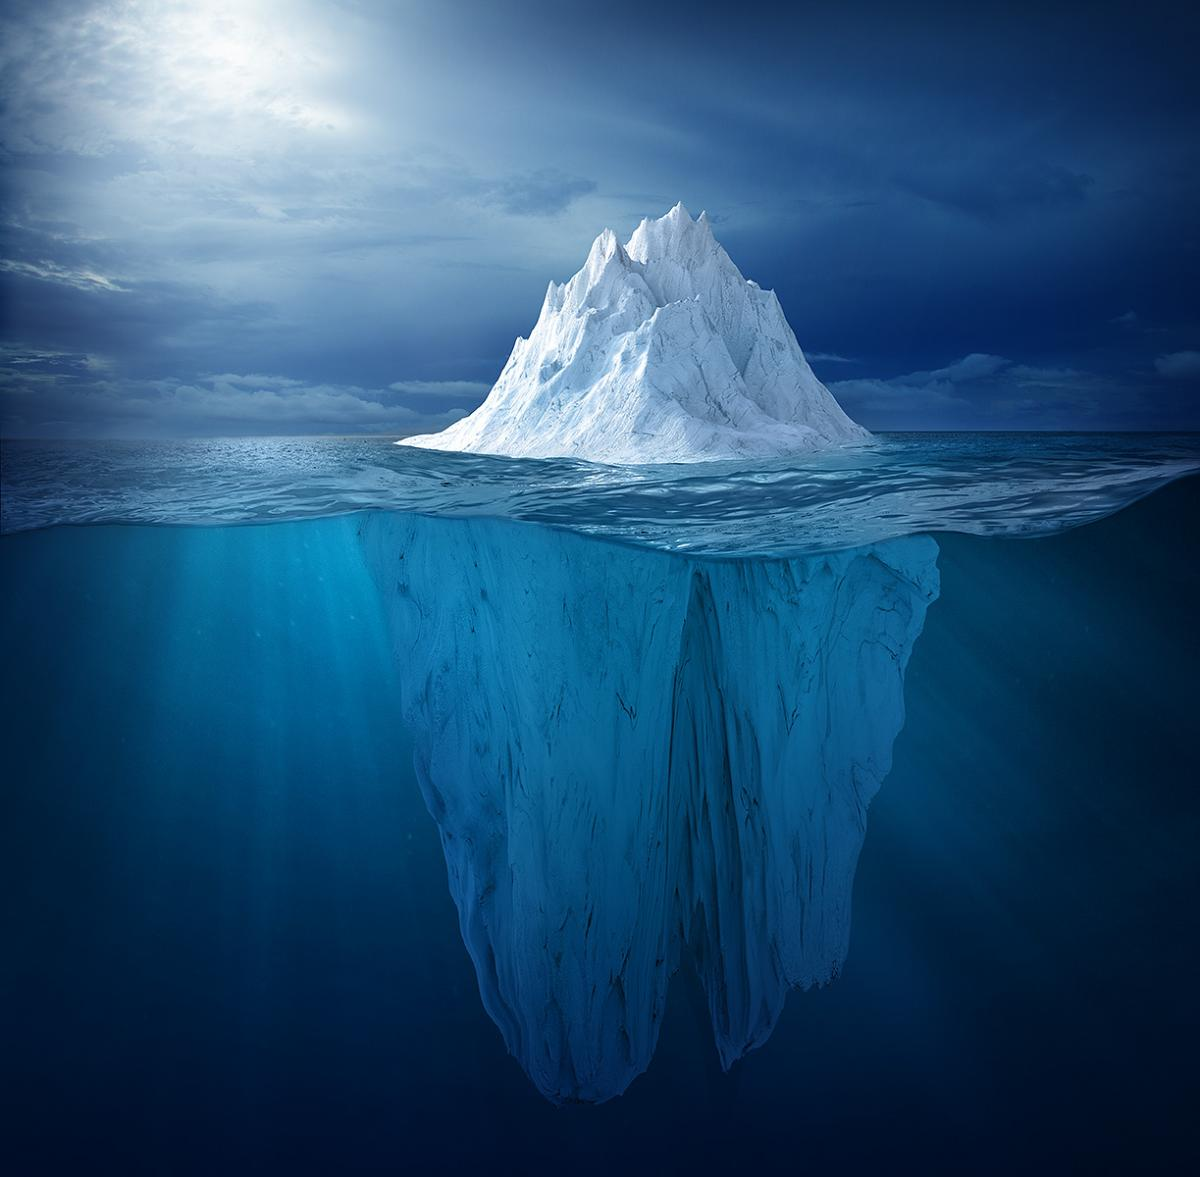 Iceberg floating in sea